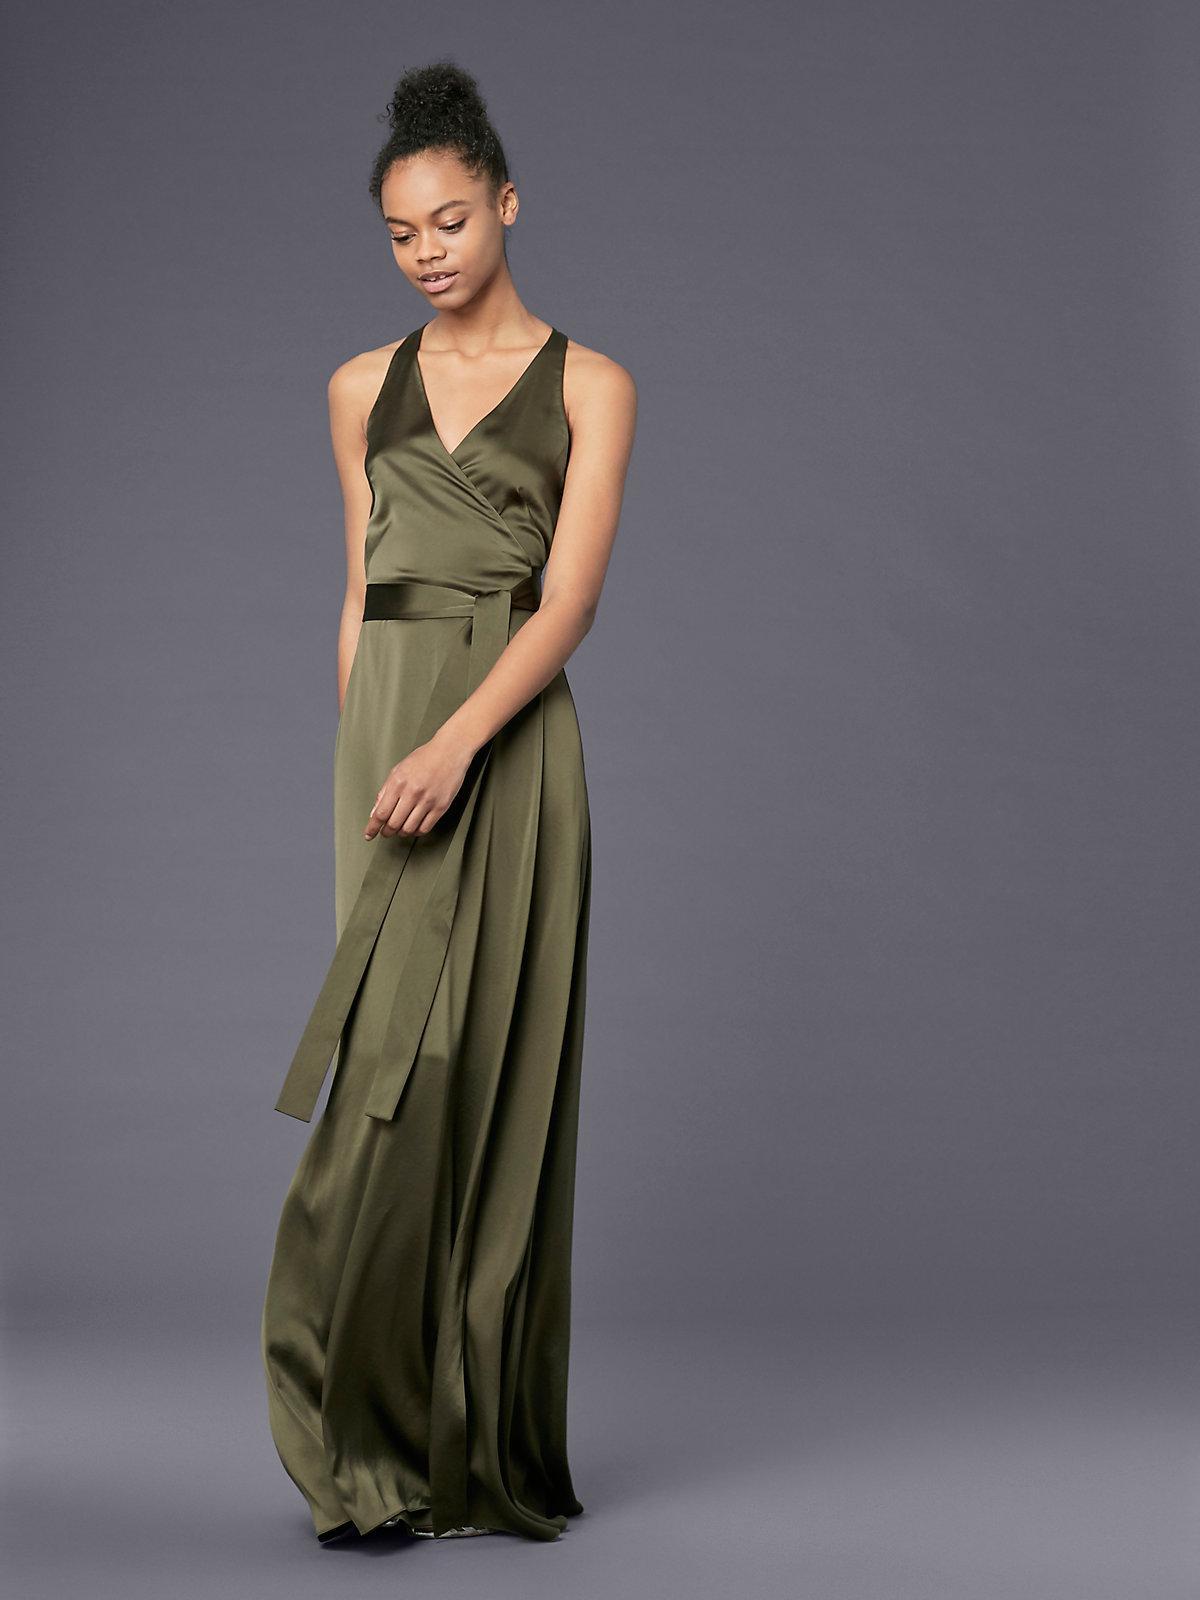 00ca613fc8a52 Diane von Furstenberg Sleeveless Floor-length Satin Wrap Dress in ...